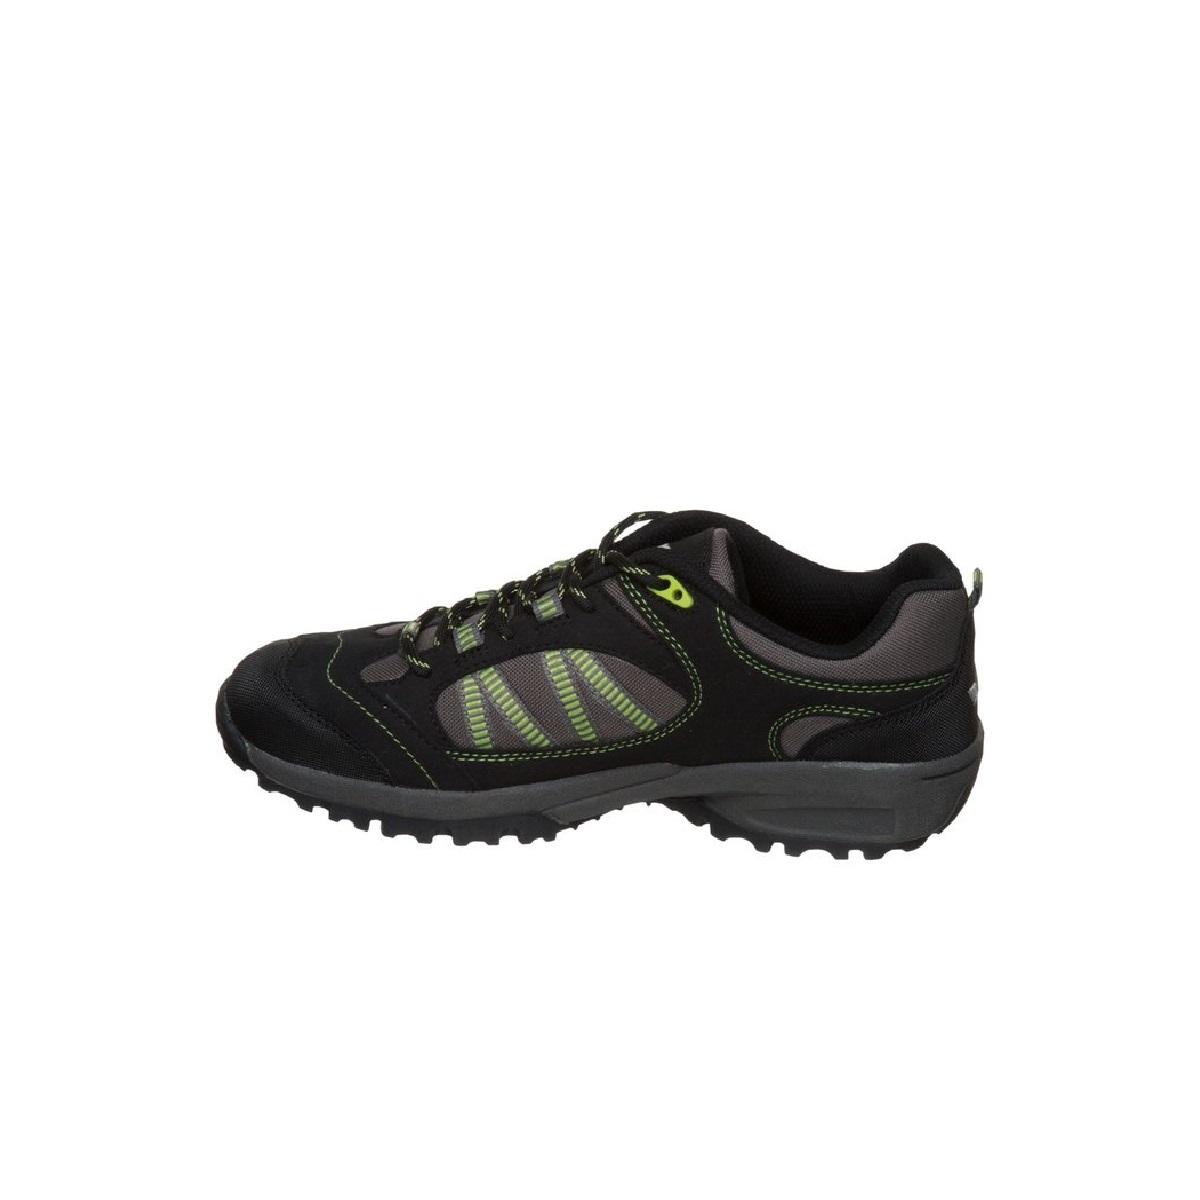 Lico Rancher Low Herren Freizeitschuhe Outdoor Schuhe – Bild 5